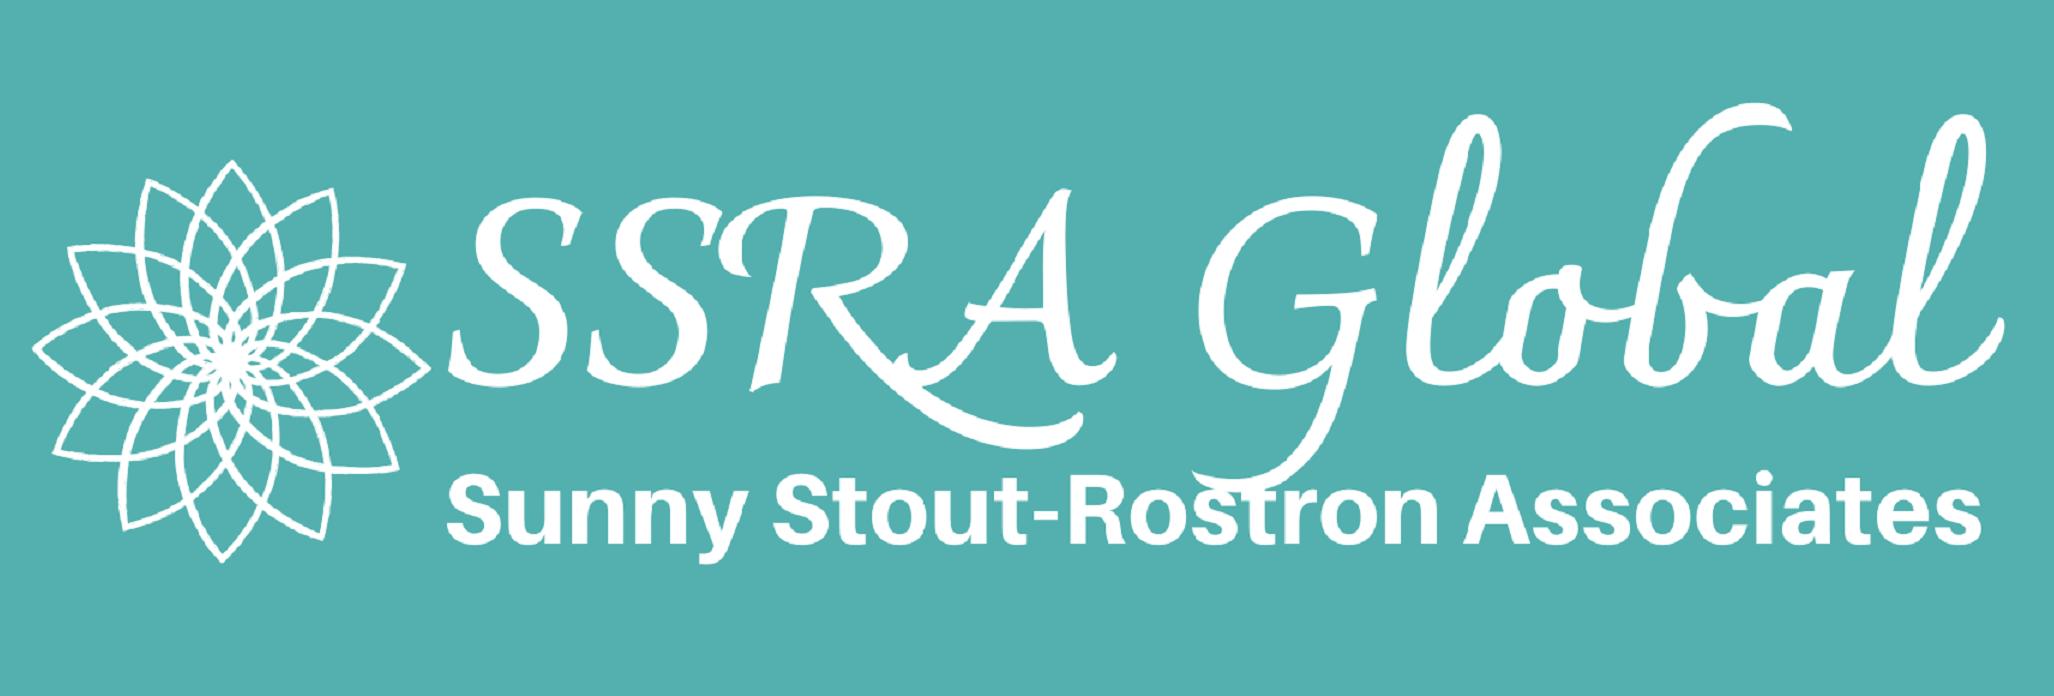 Sunny Stout-Rostron Associates